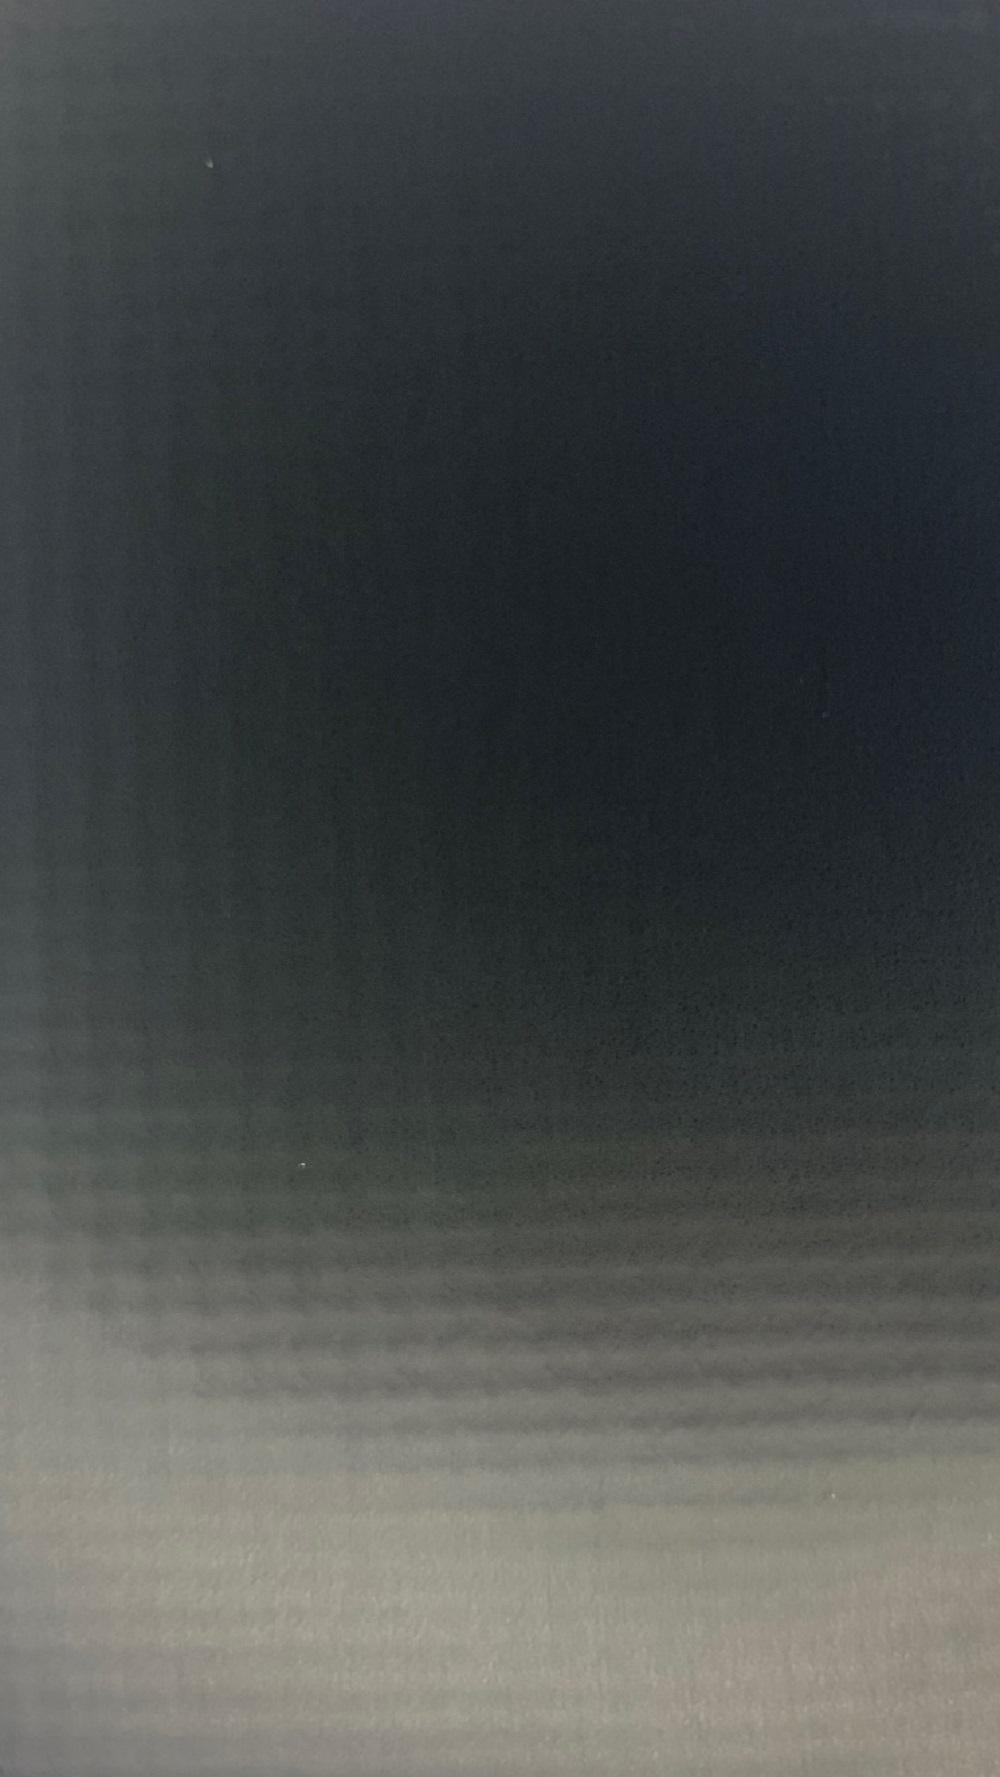 Lona Vinilona Df Fosca Preto S-002 1,45mt X 1,0mt